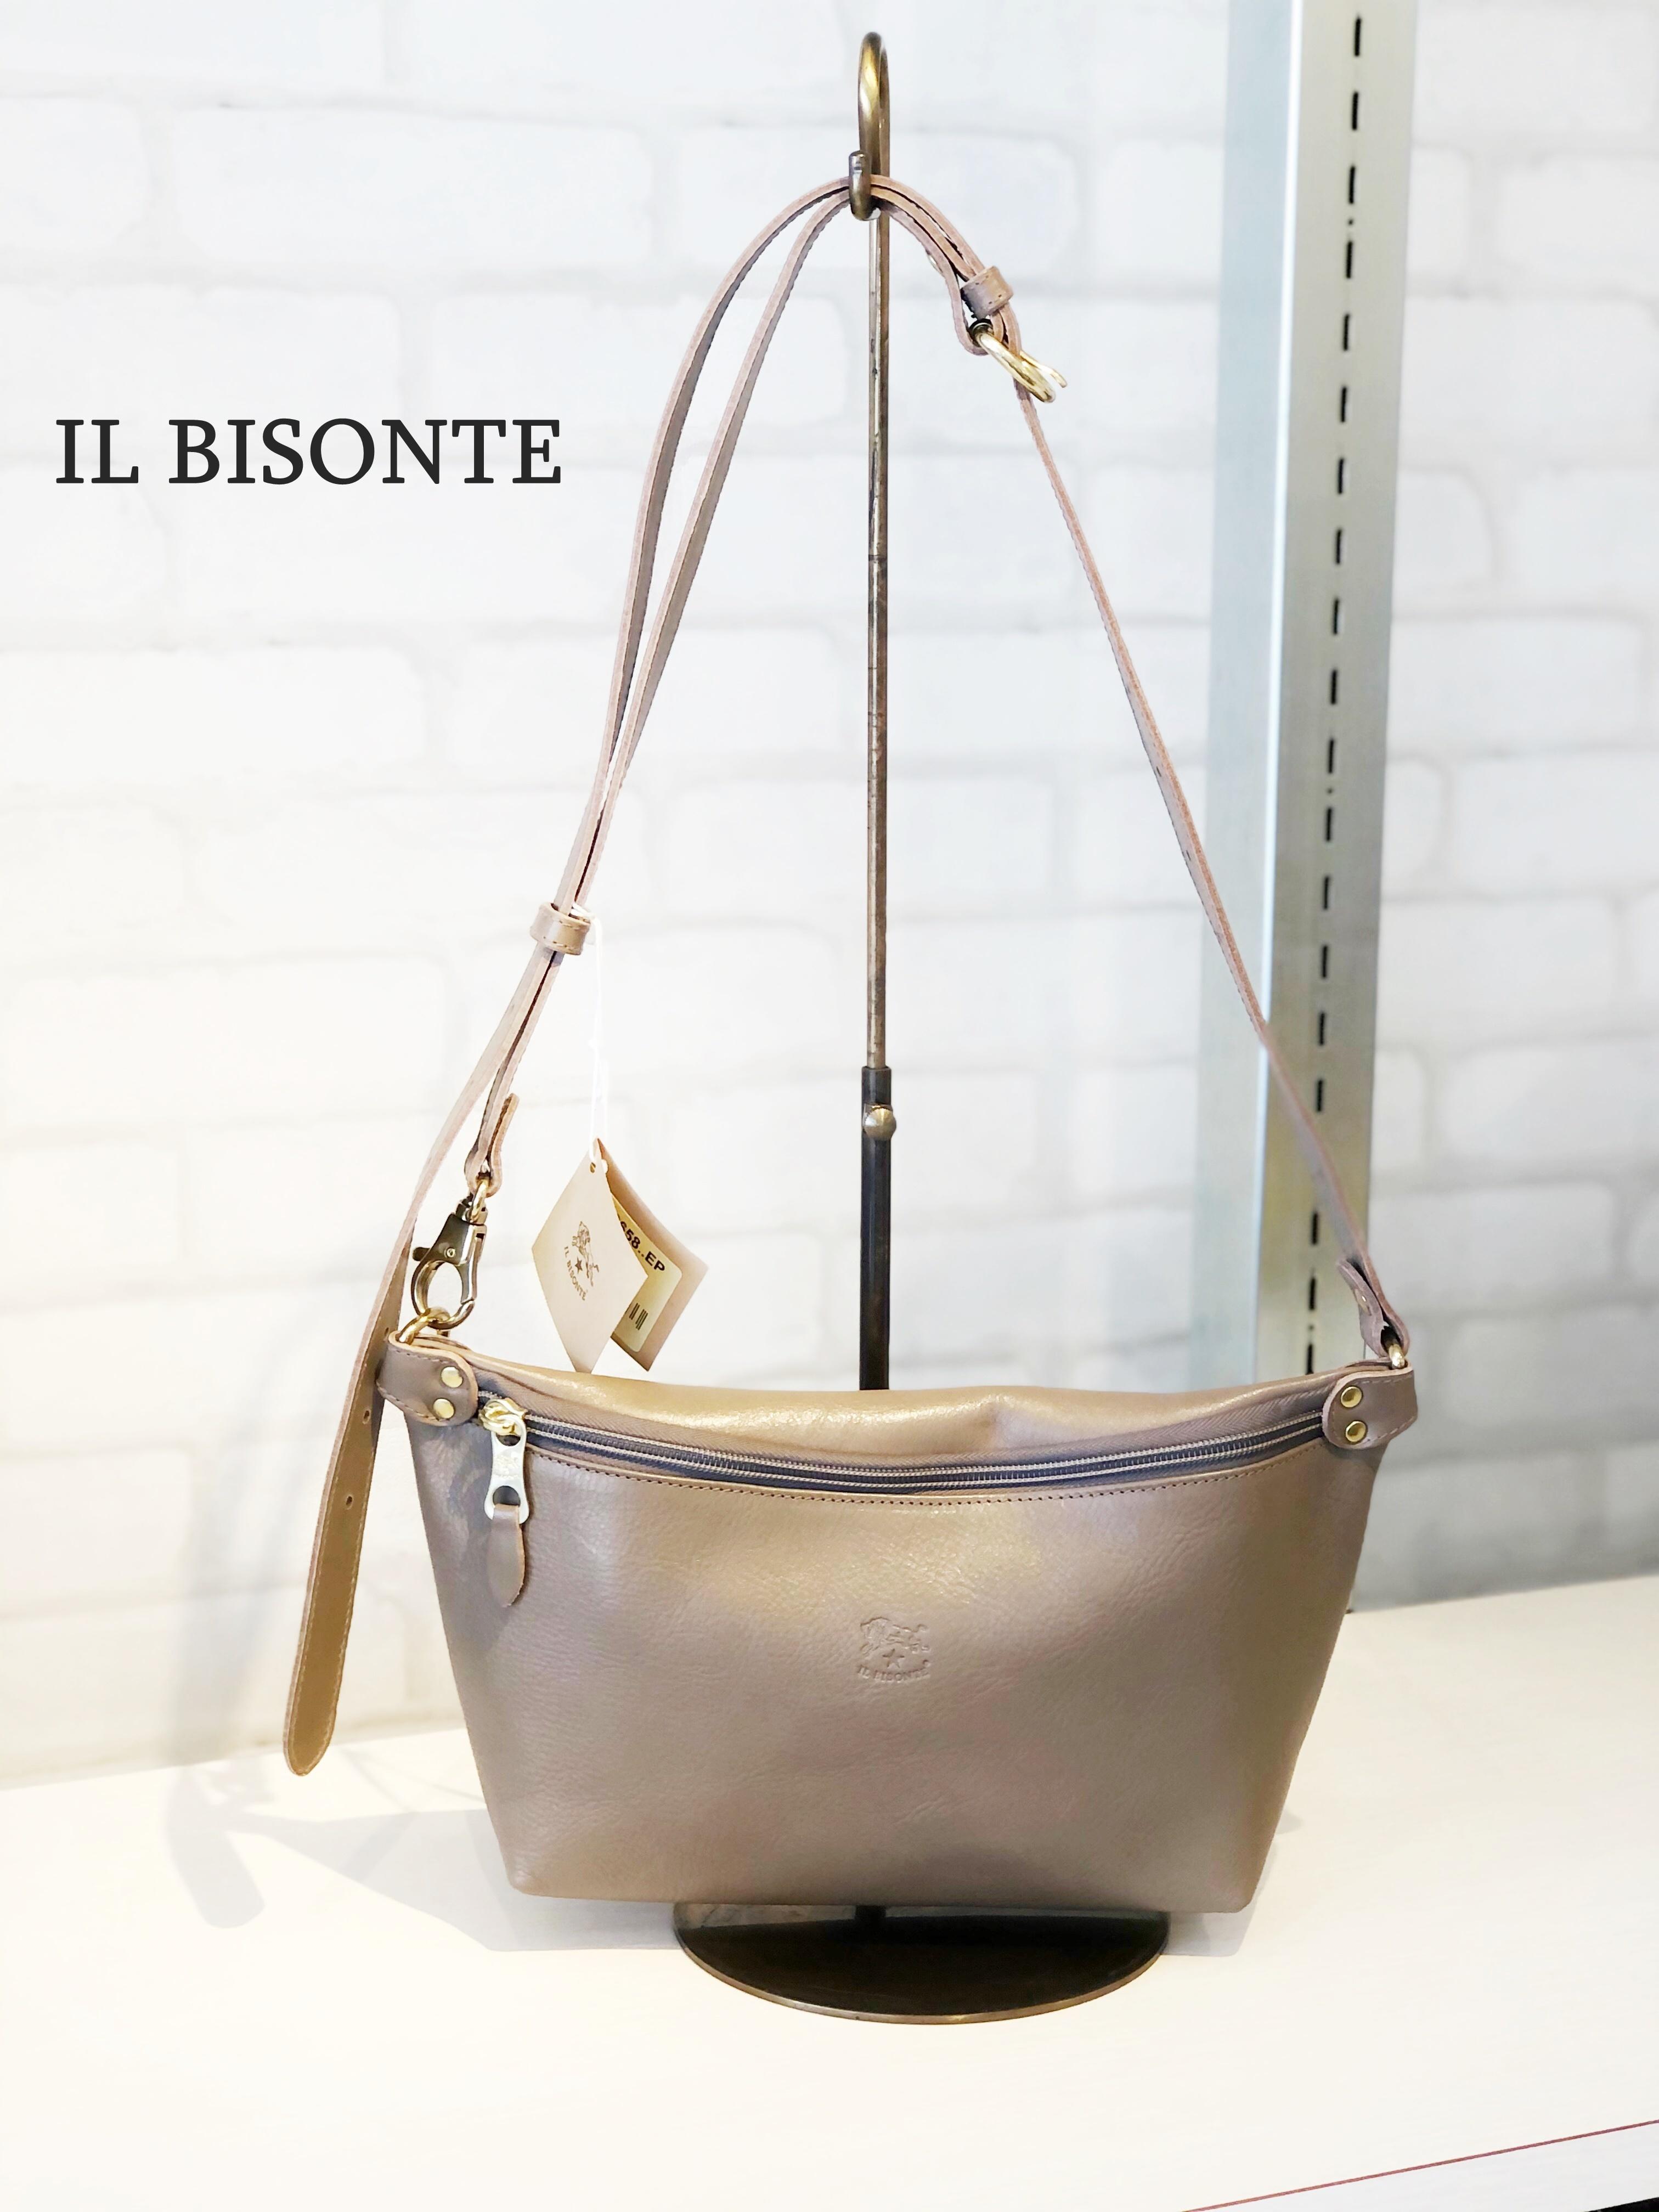 IL BISONTE(イルビゾンテ)/ショルダーバッグ/00116(グレー)